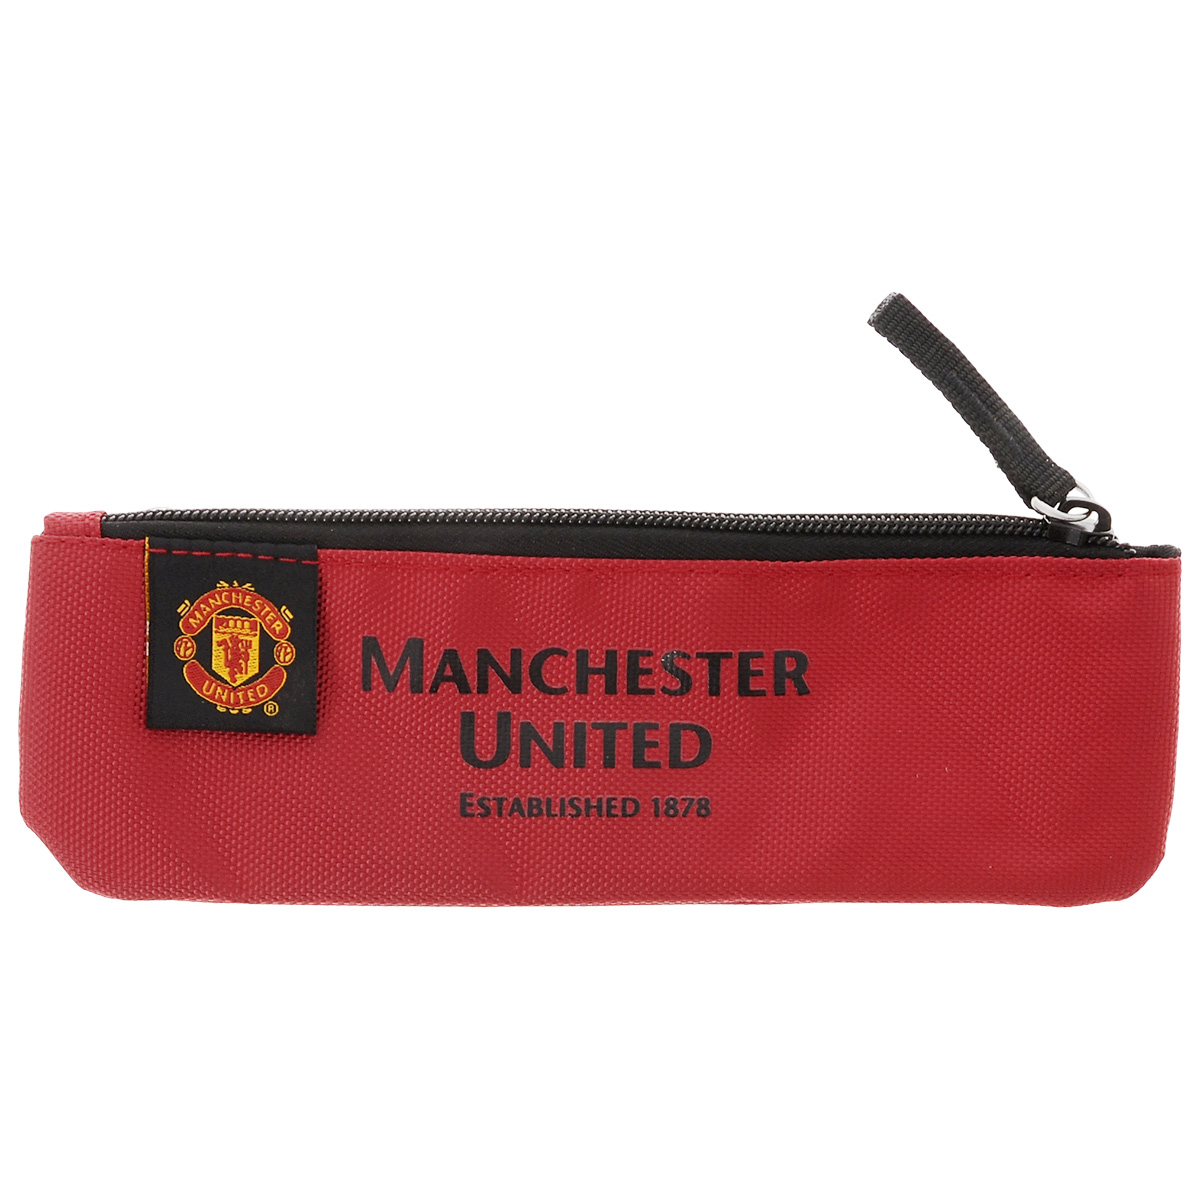 Пенал Manchester United FC, цвет: красный пеналы target collection пенал с канцтоварами fc bavaria 2